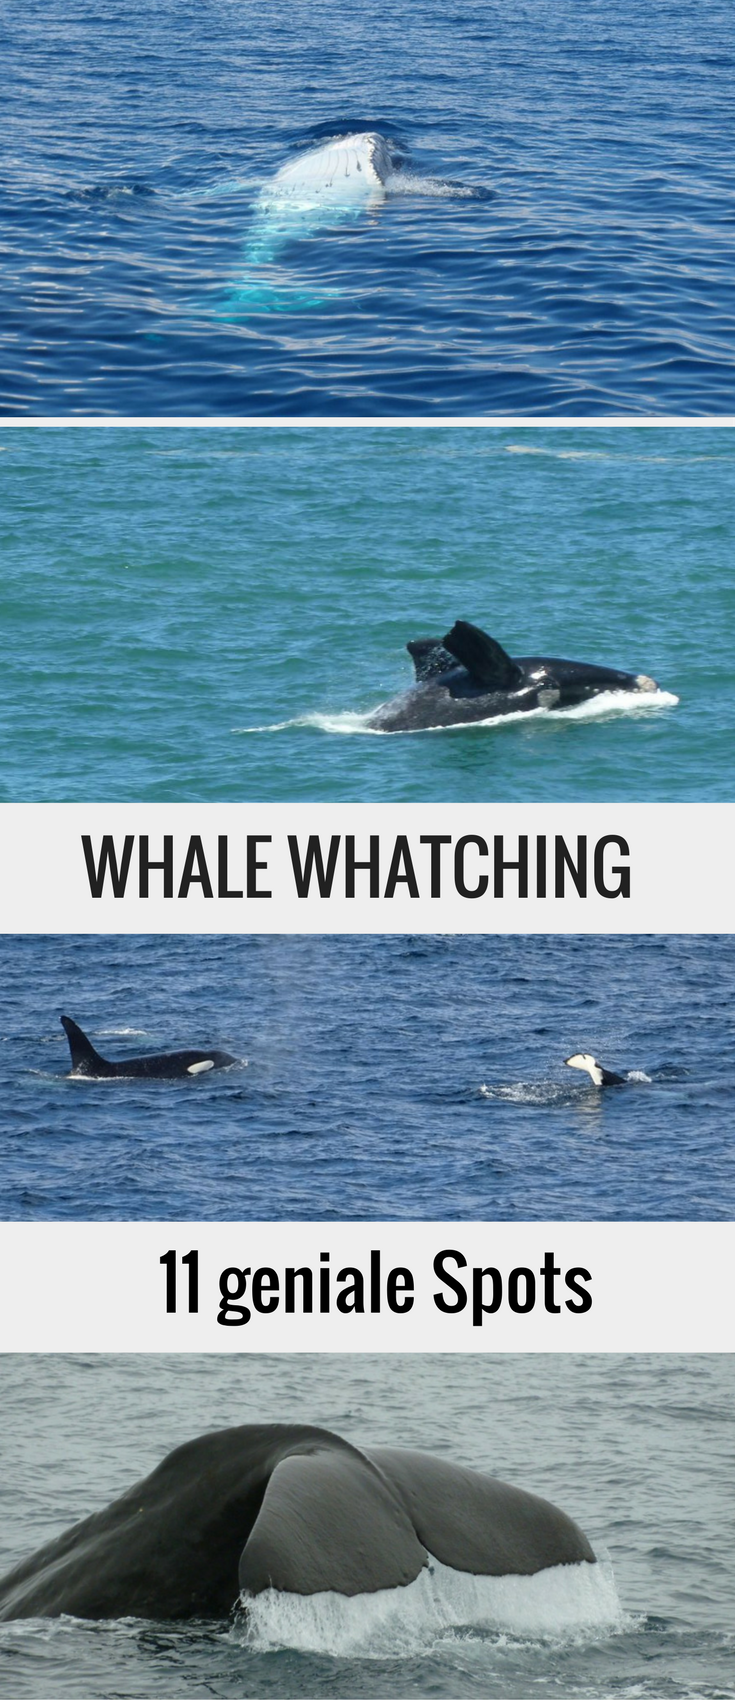 Wale beobachten: 11 Whale Watching Spots | Travelinspired ...